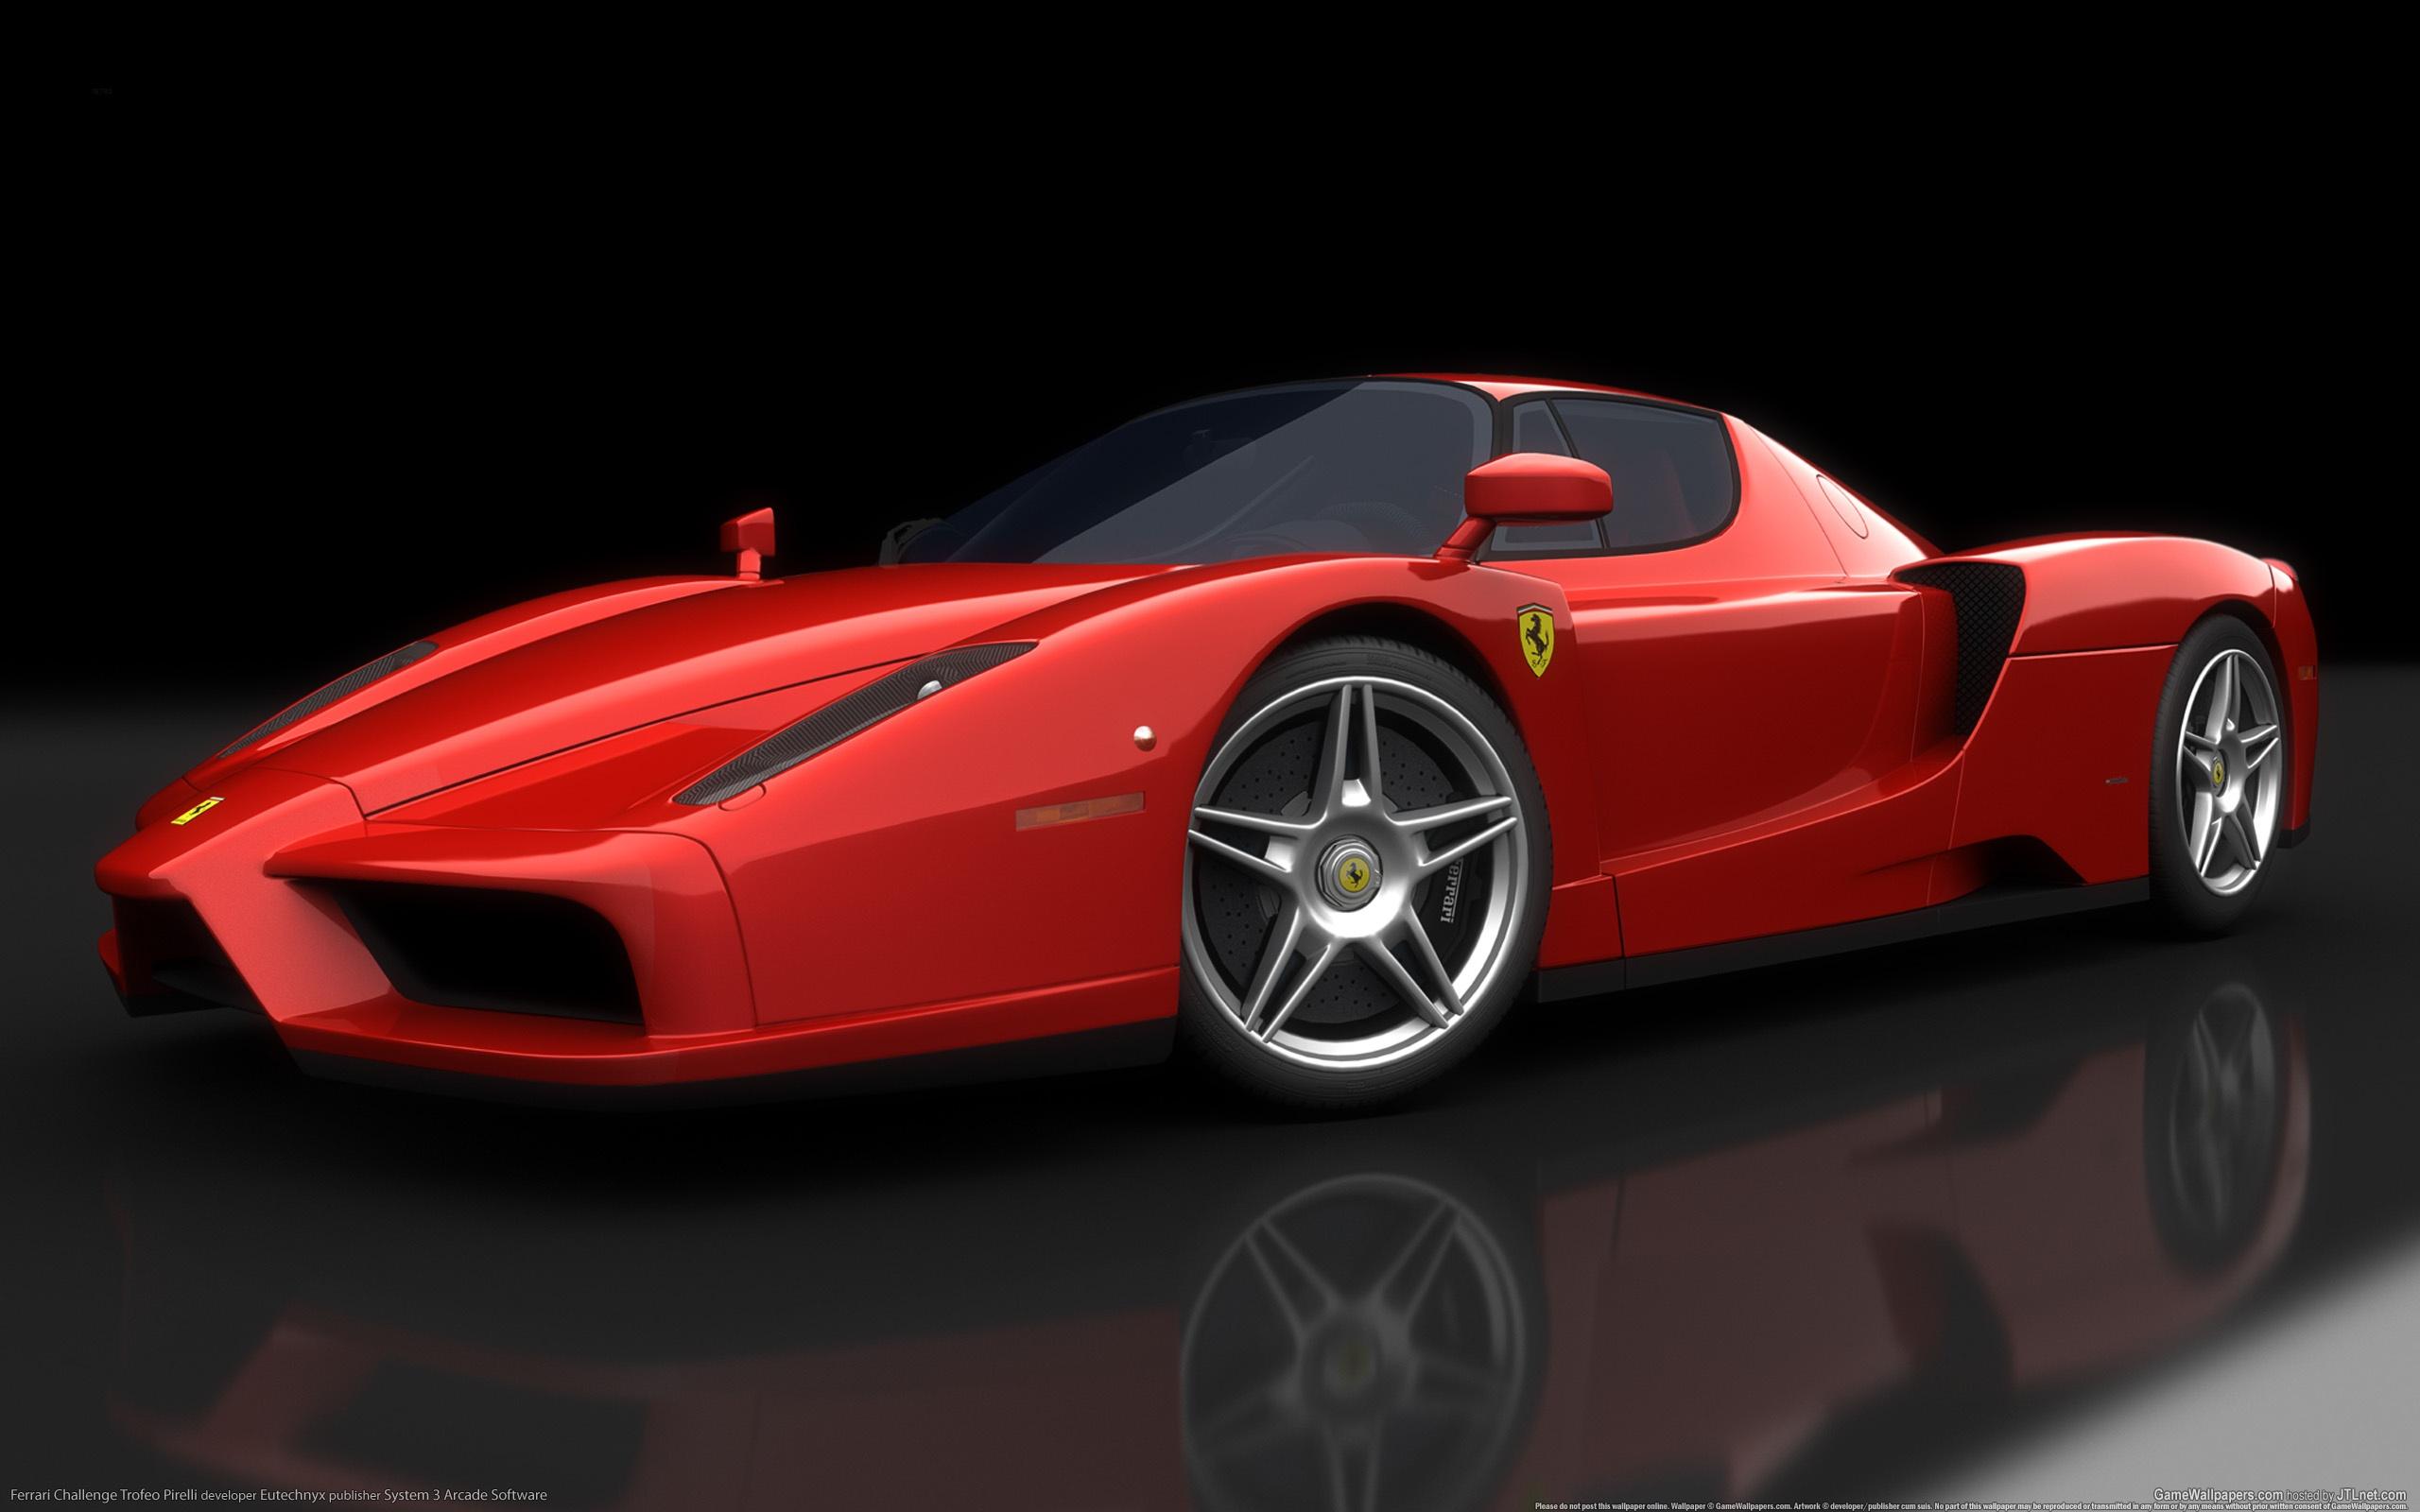 2 Ferrari Challenge Trofeo Pirelli Hd Wallpapers